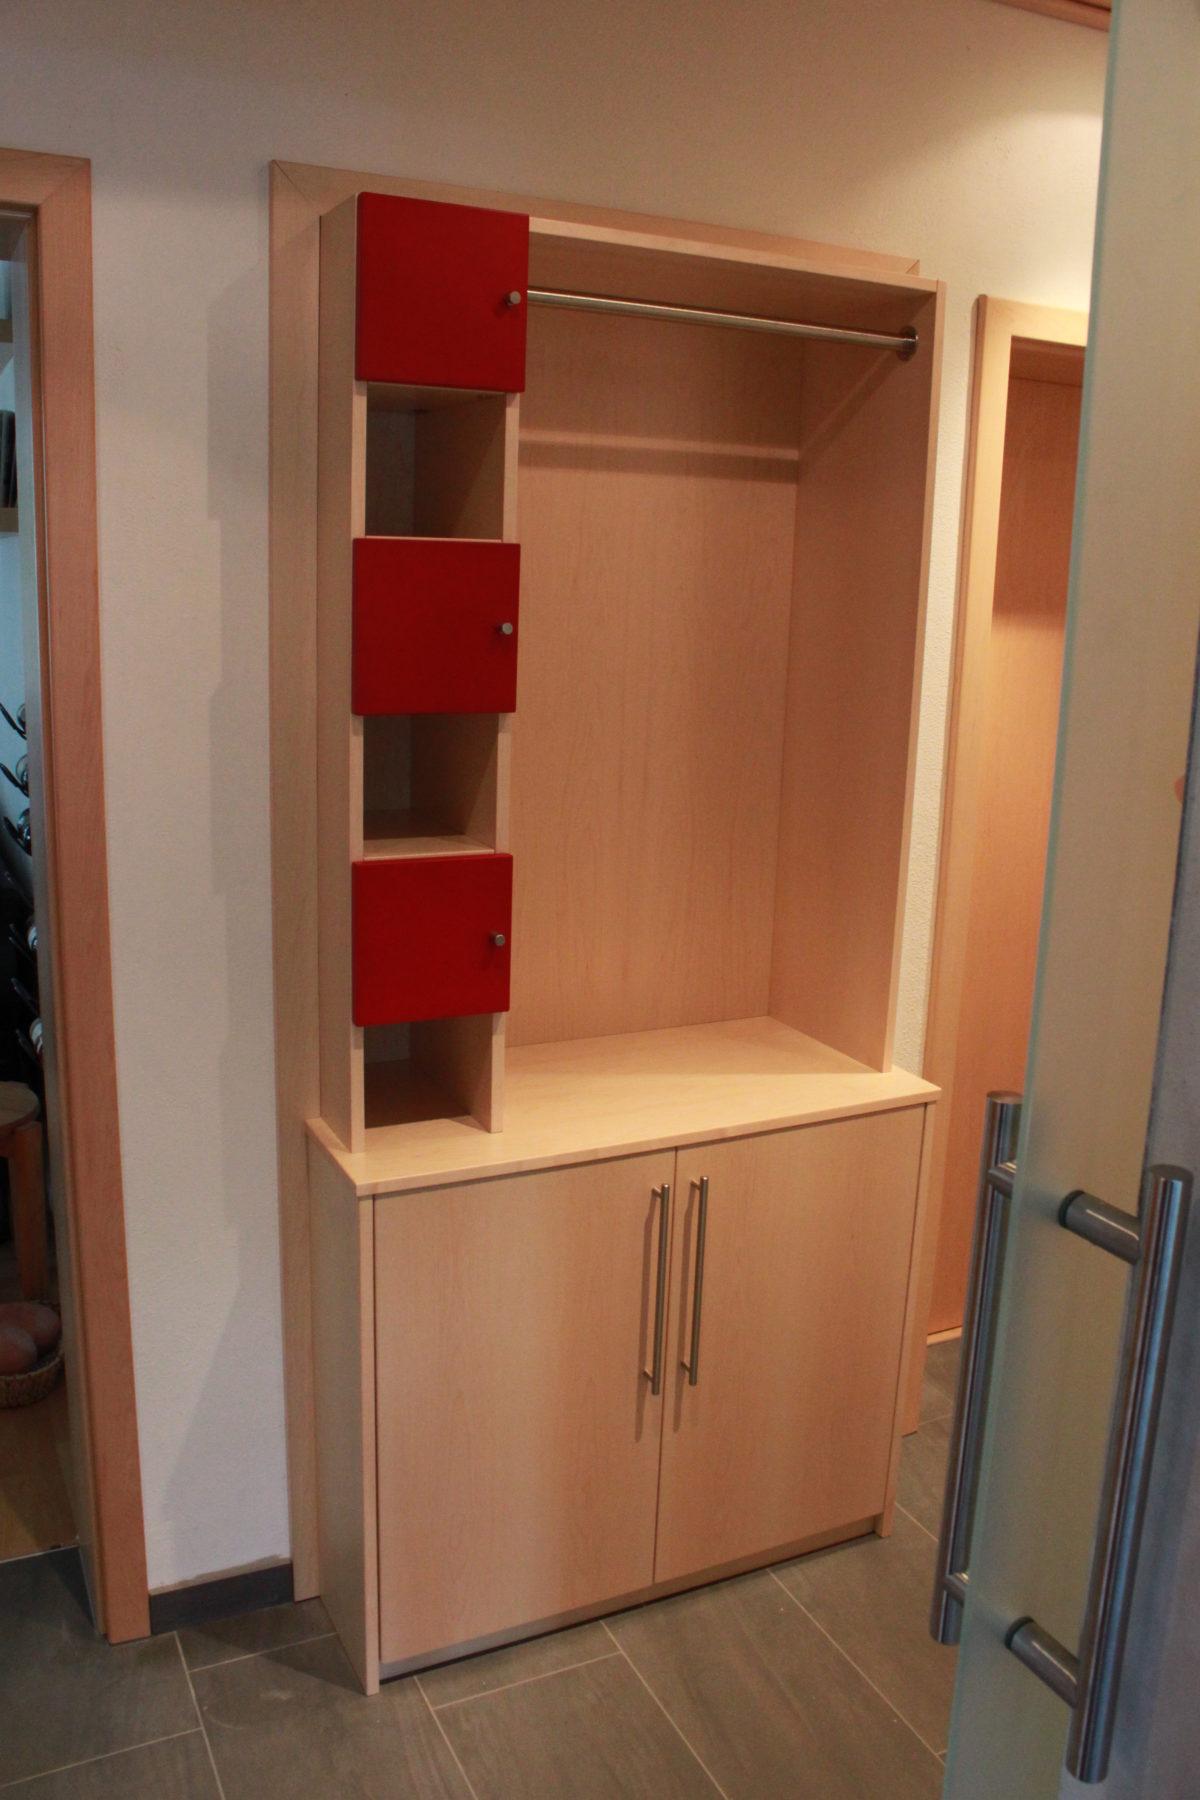 Garderobe in vorhandenen Türrahmen eingebaut